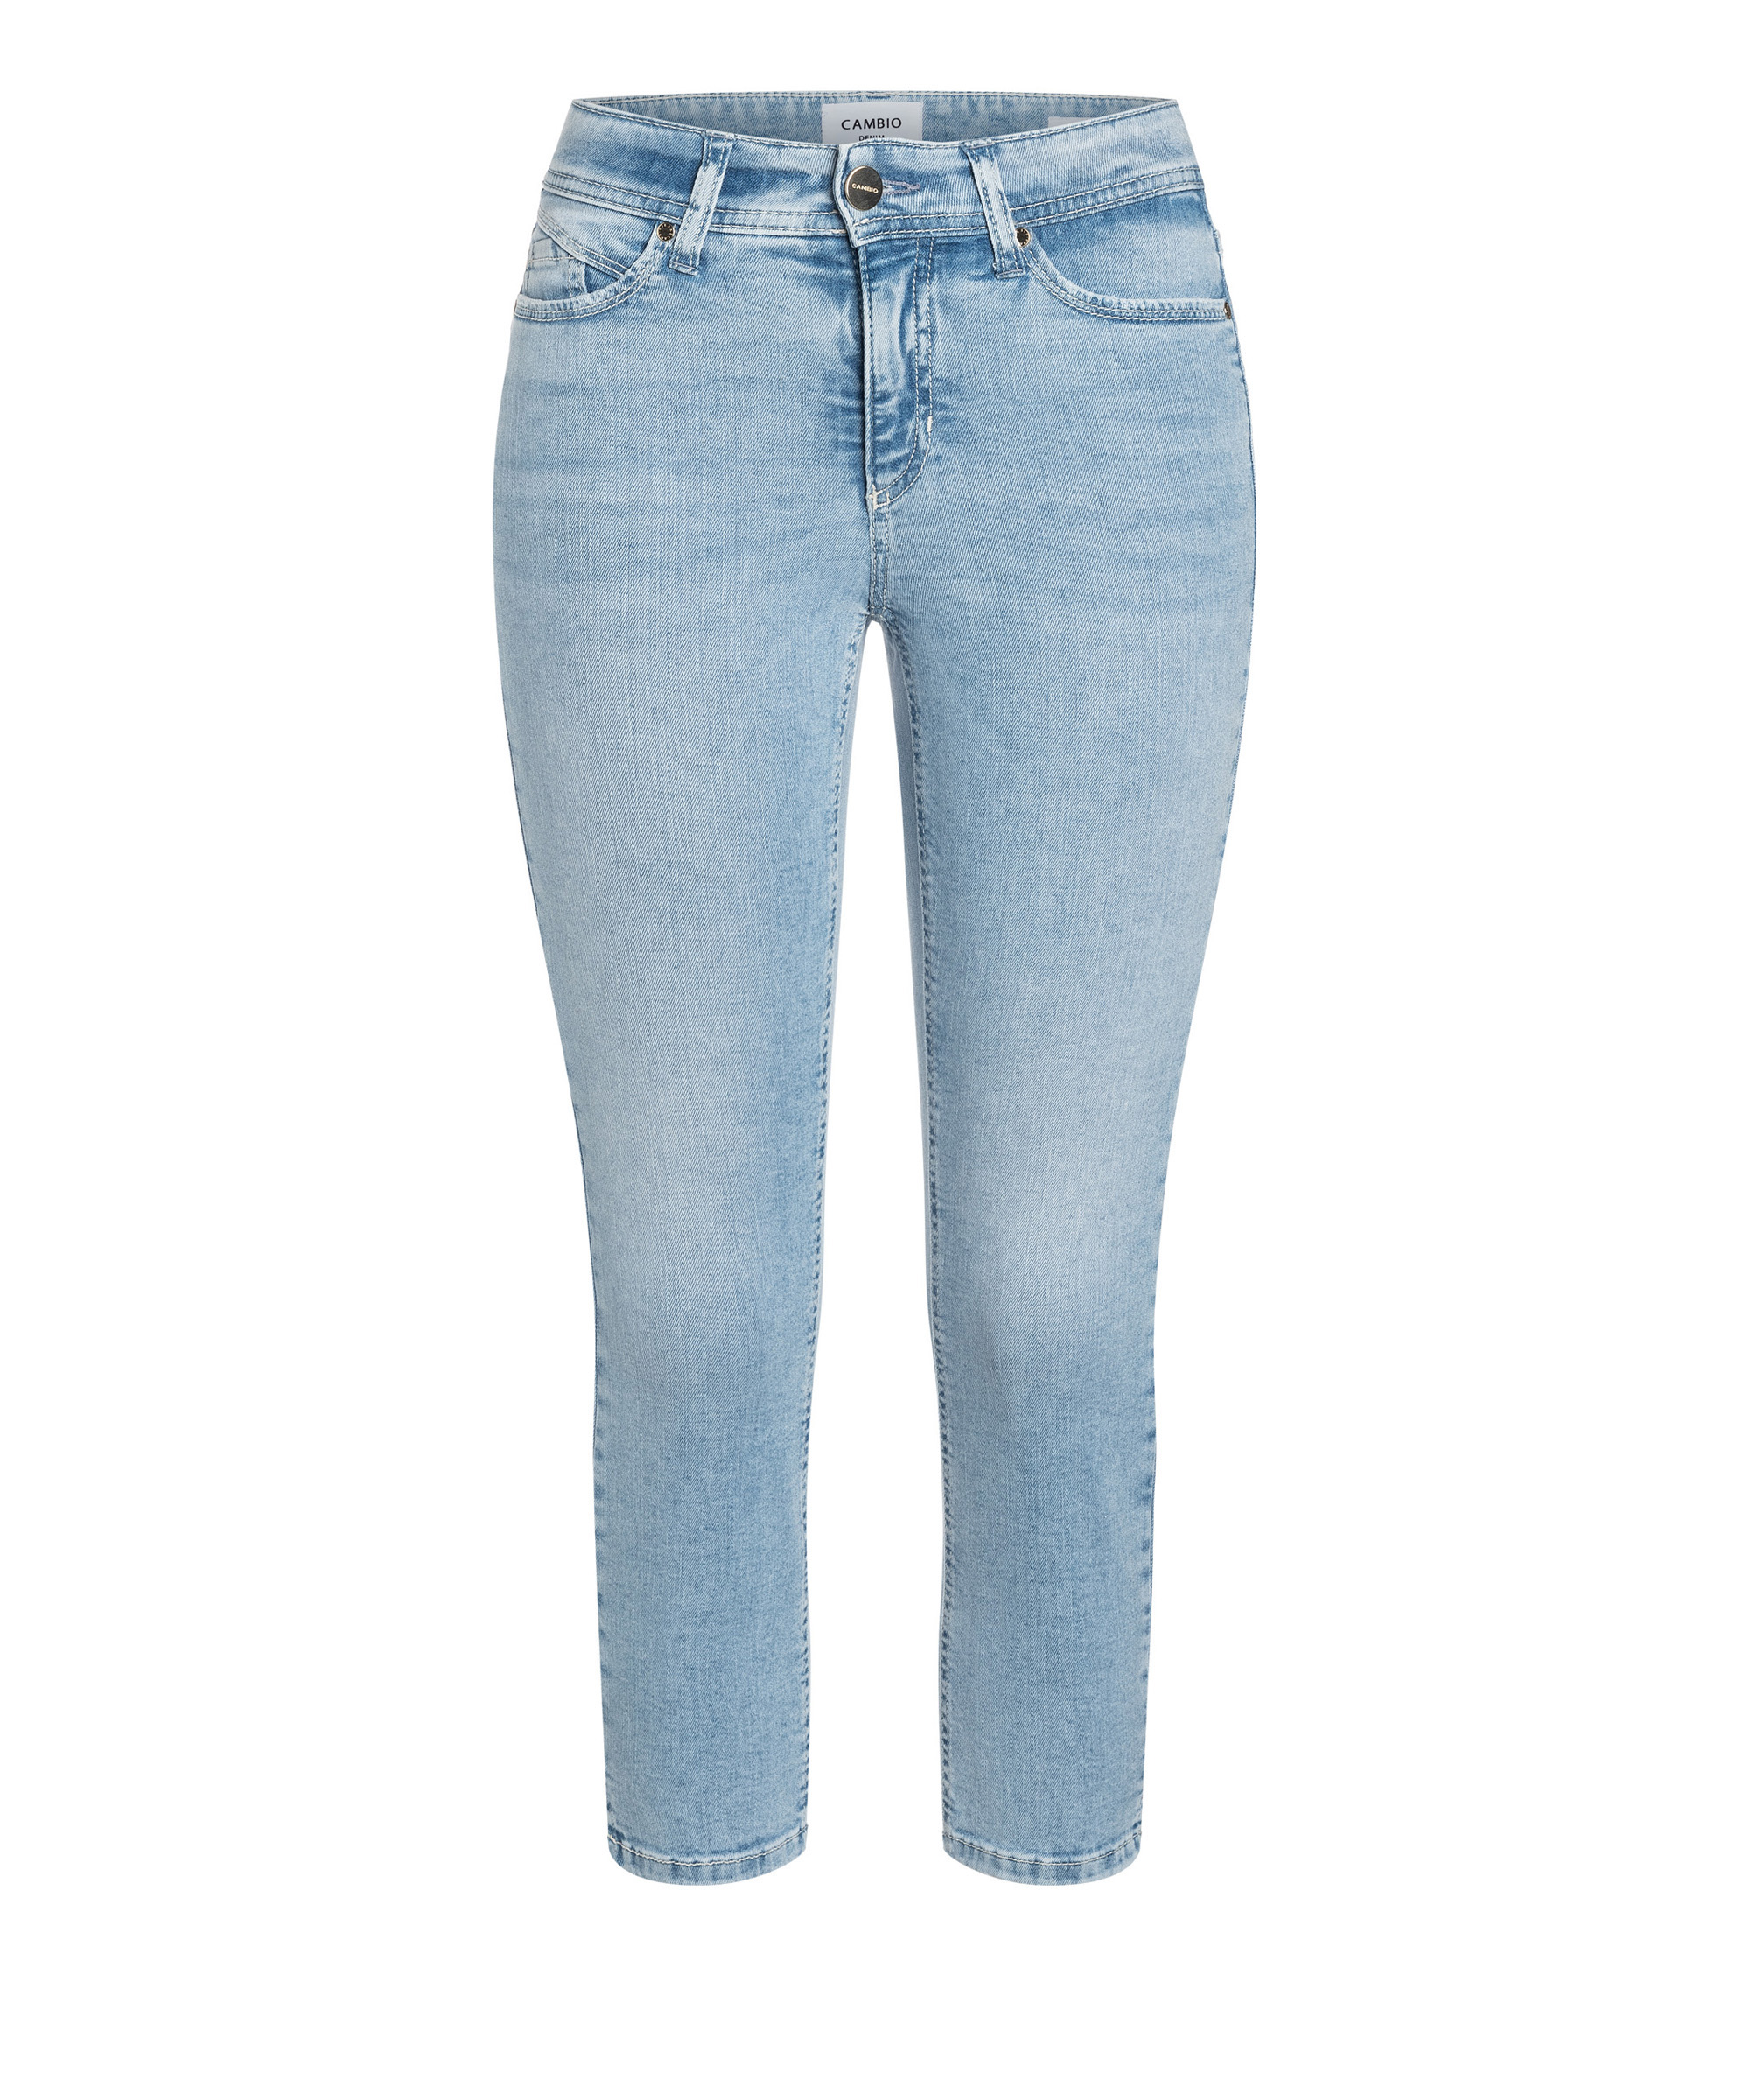 Cambio Jeans Parla capri LIGHT BLEACHED